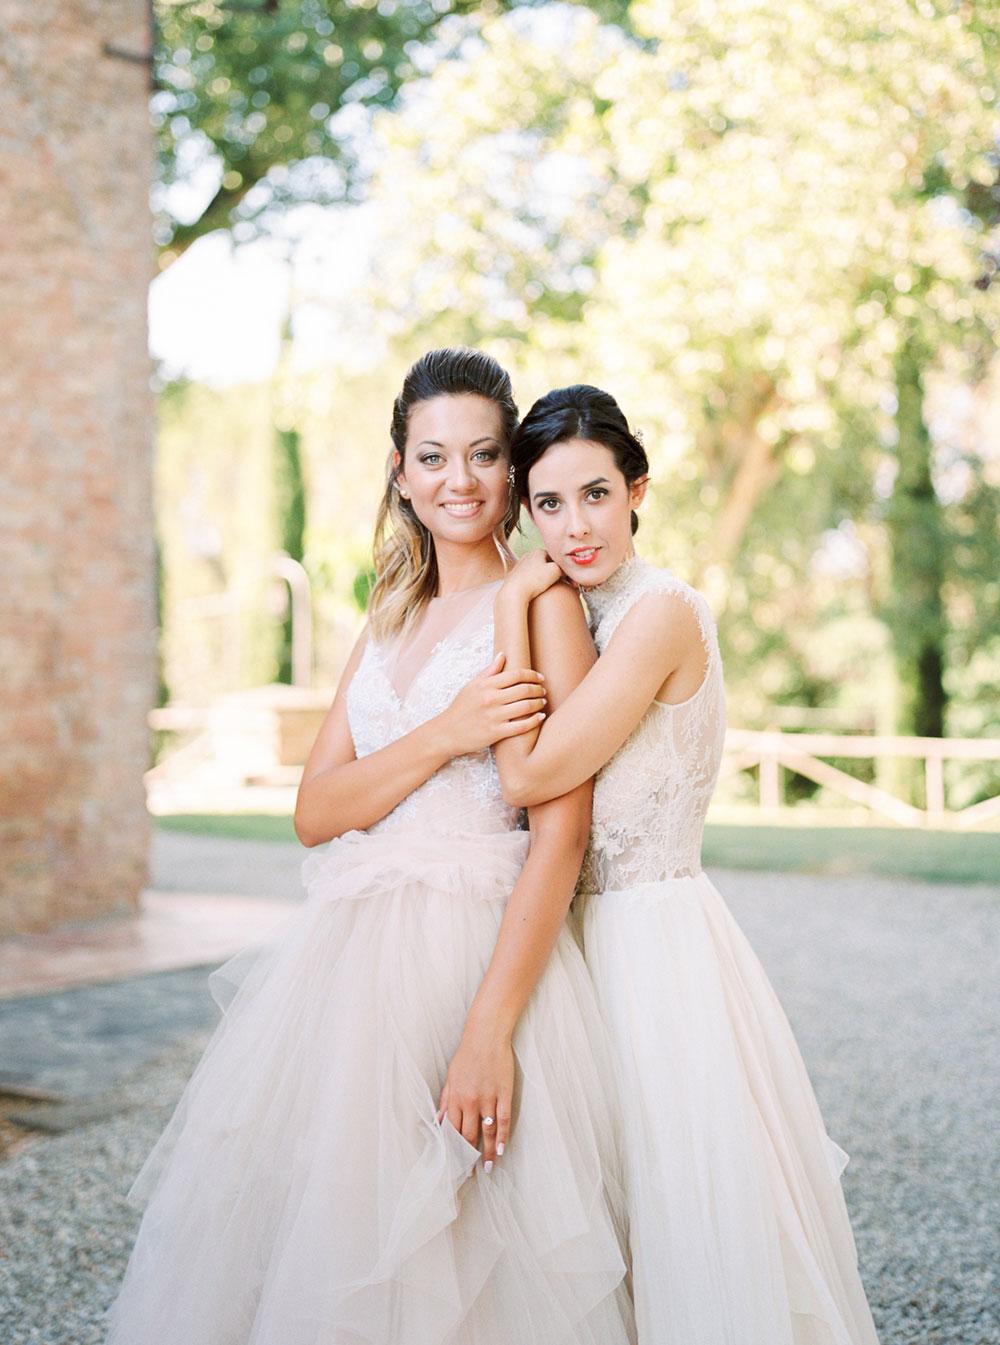 Linari-Tuscany-Elopement-Courtney-Michaela-237